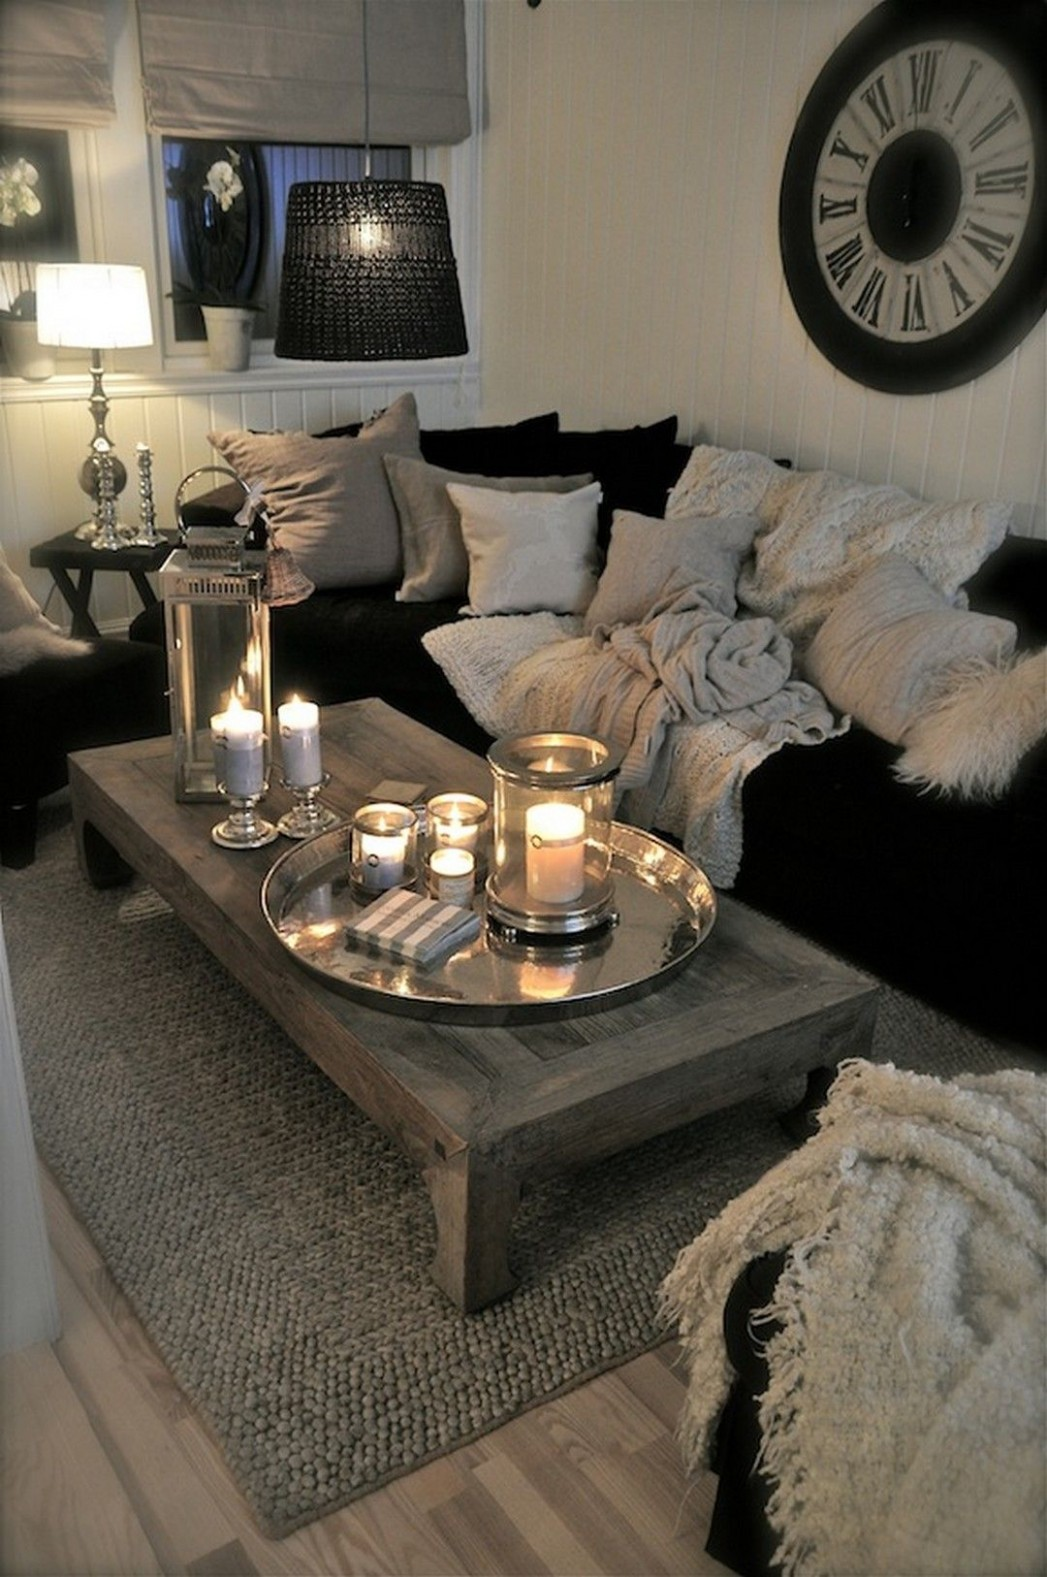 9 Easy DIY First Apartement Decorating Ideas - Architecturehd  - Apartment Decor Ideas Diy